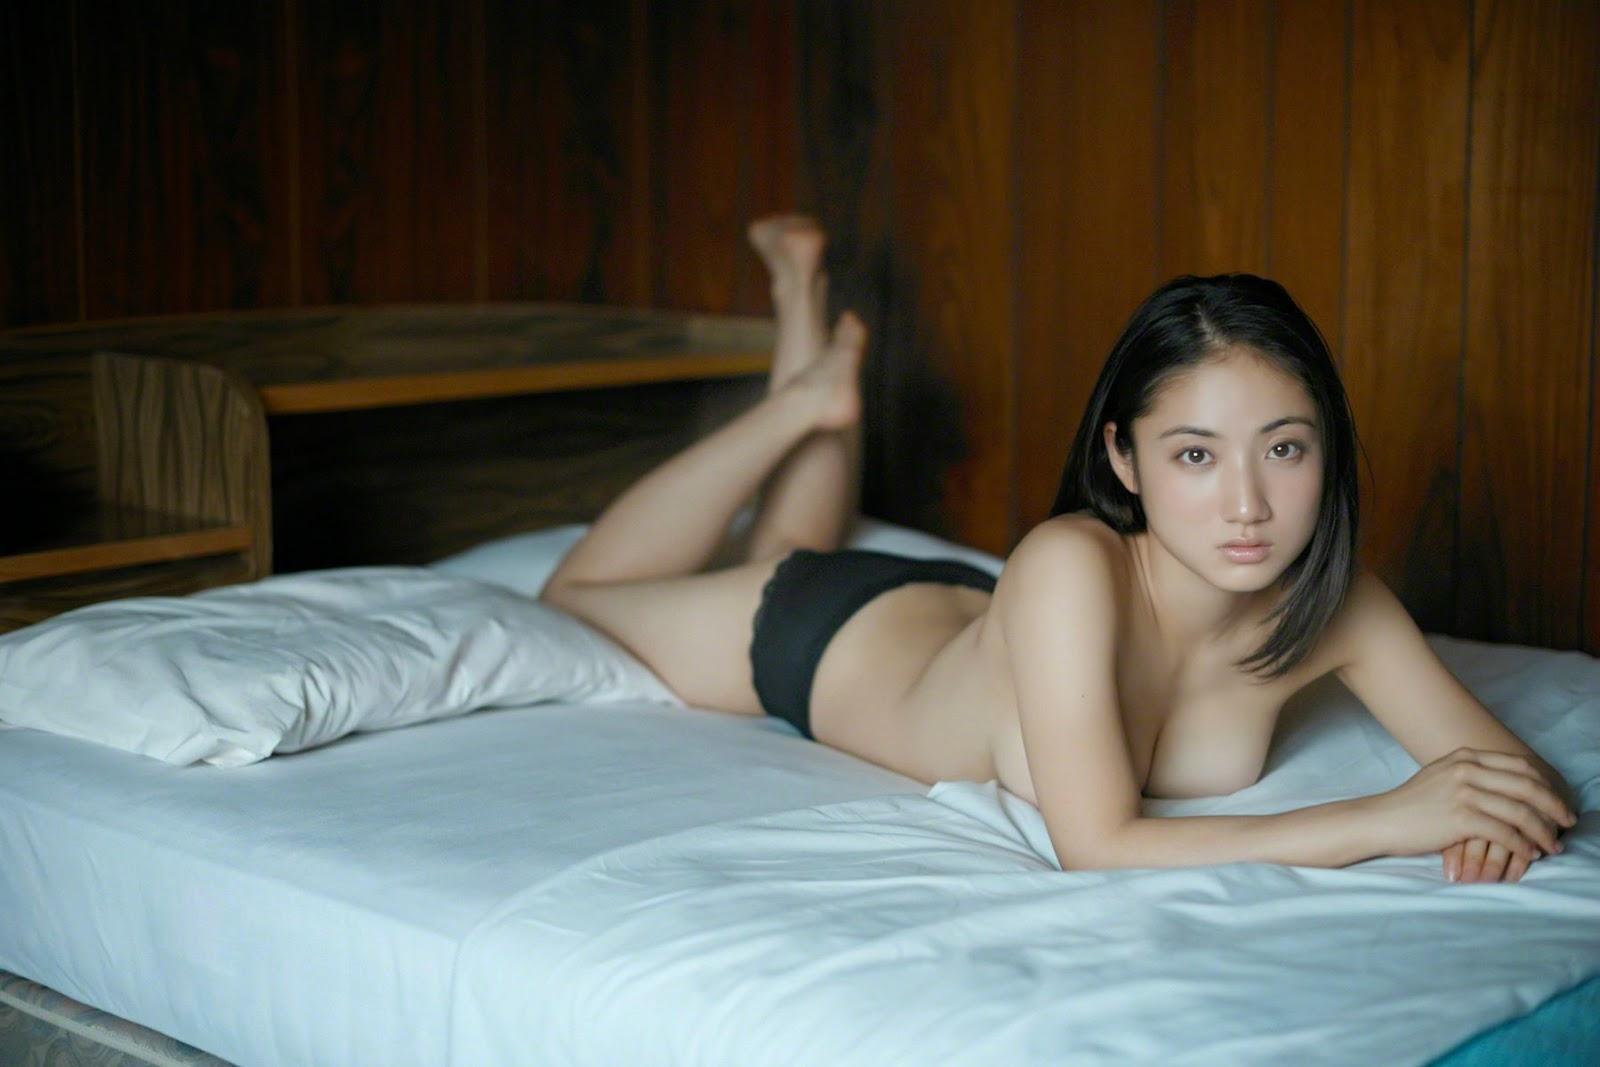 saaya suzuki pussy pics naked girls page 17   sexy erotic girls